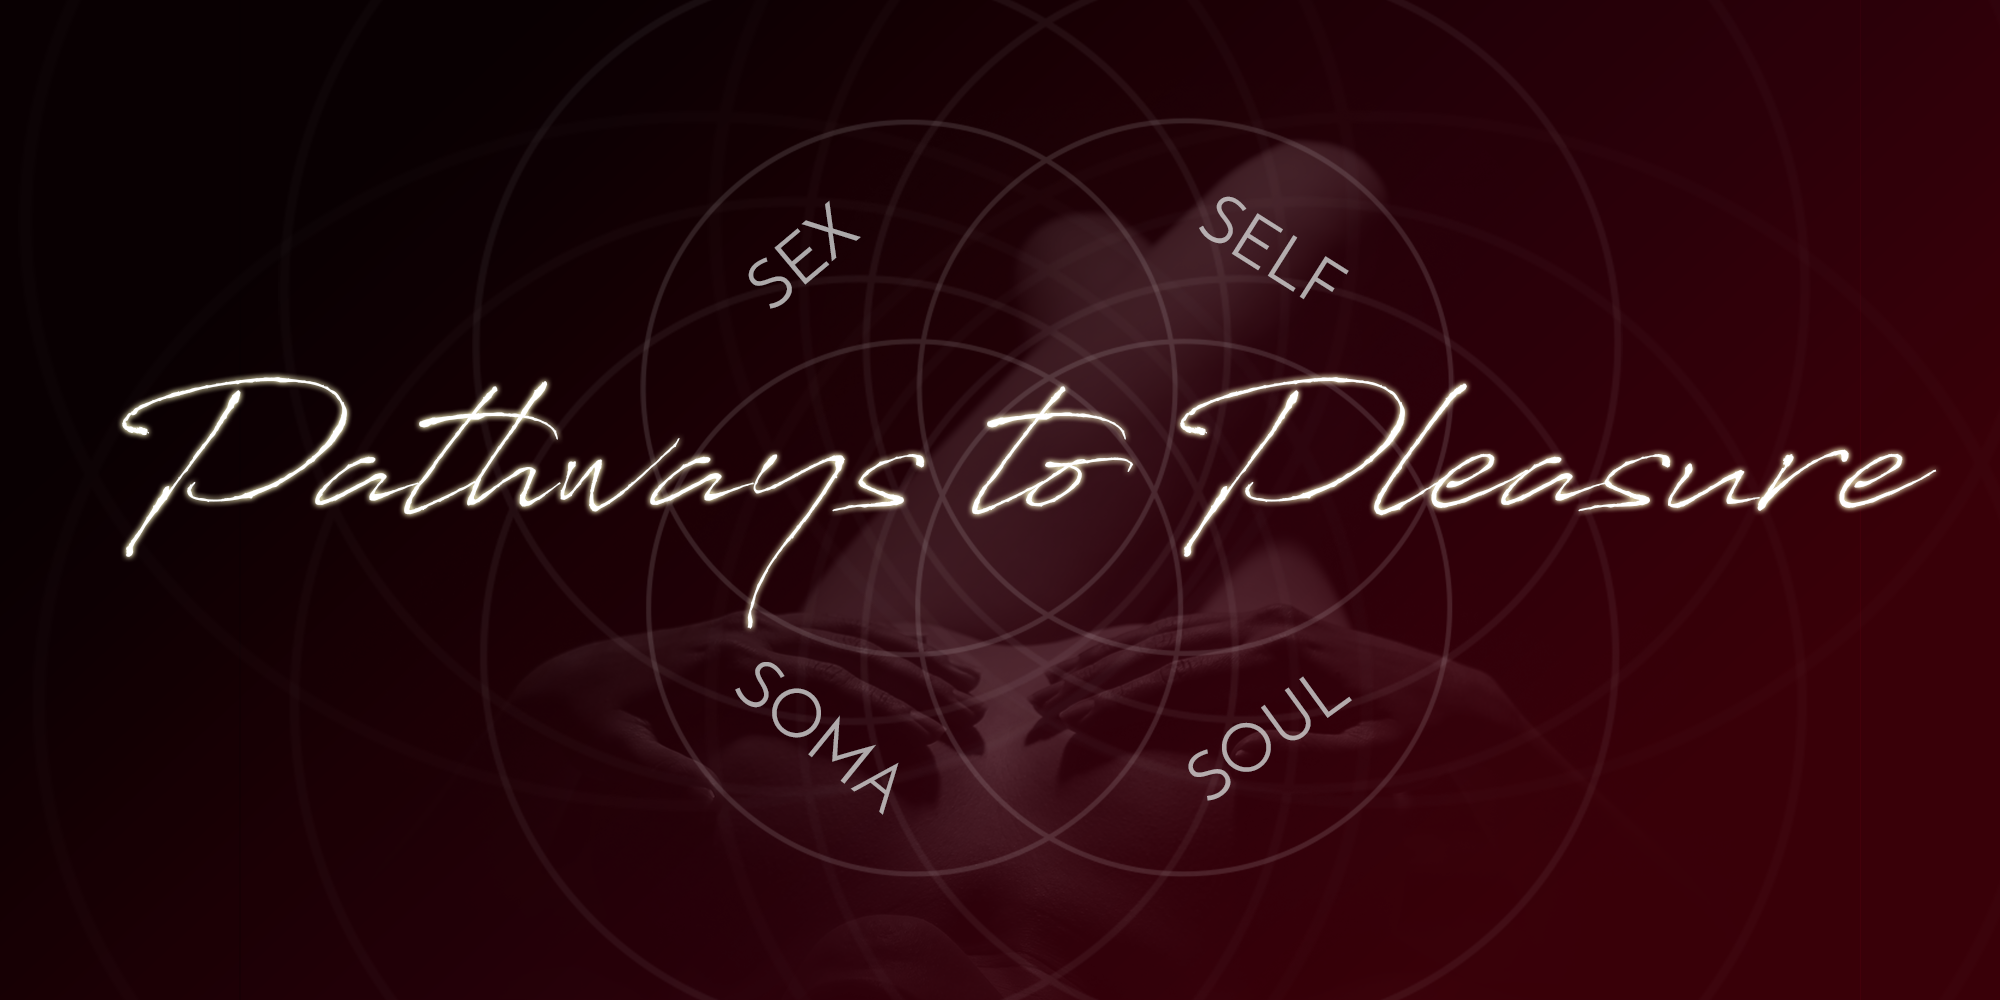 Pathways-to-Pleasure-Banner-4.png